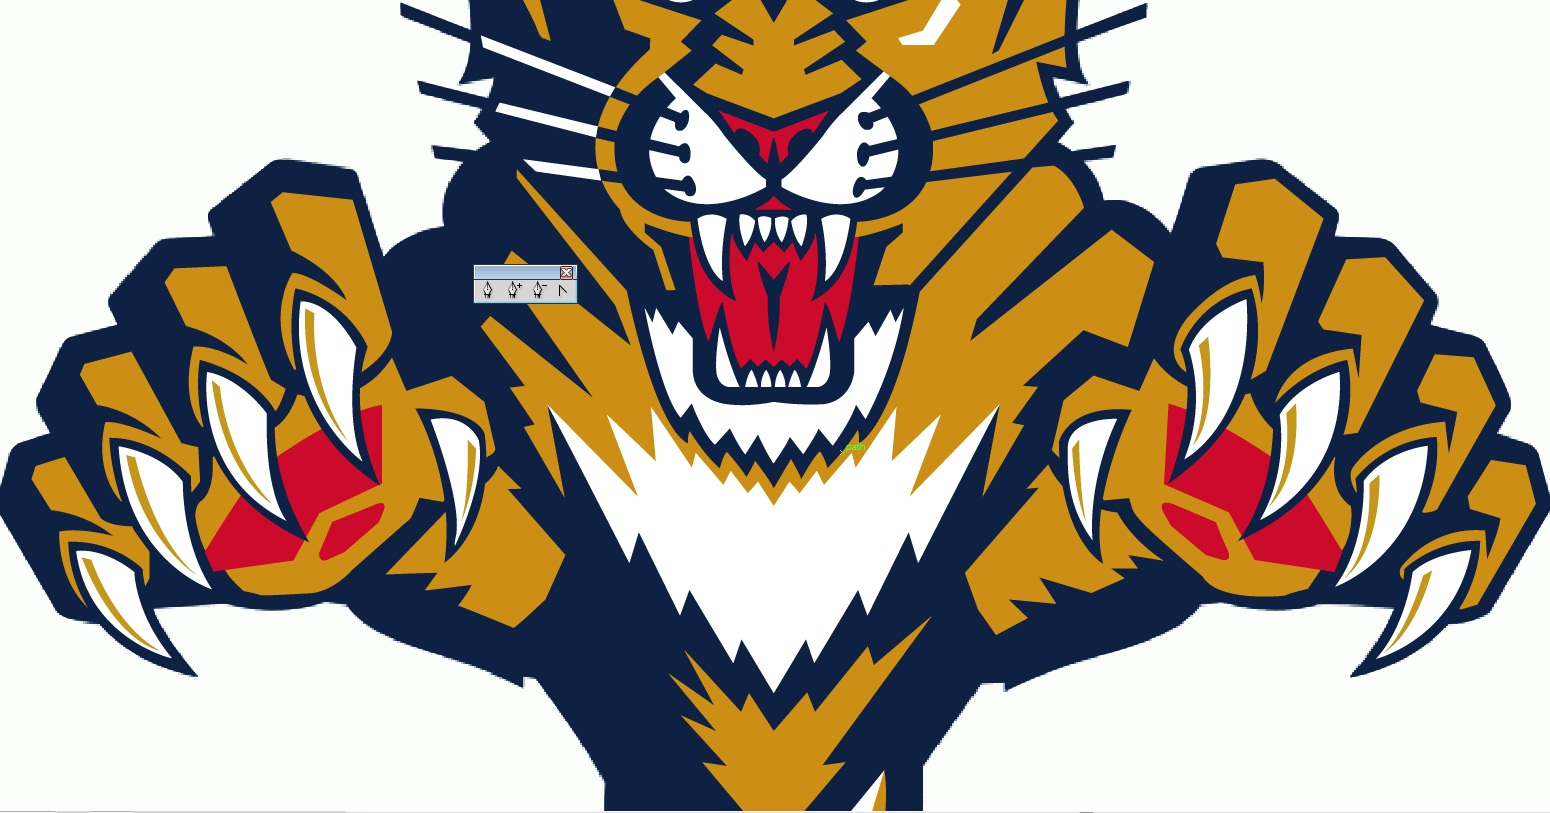 1550x813 Illustrator Sports Logo Reproduction The Florida Panthers Aura